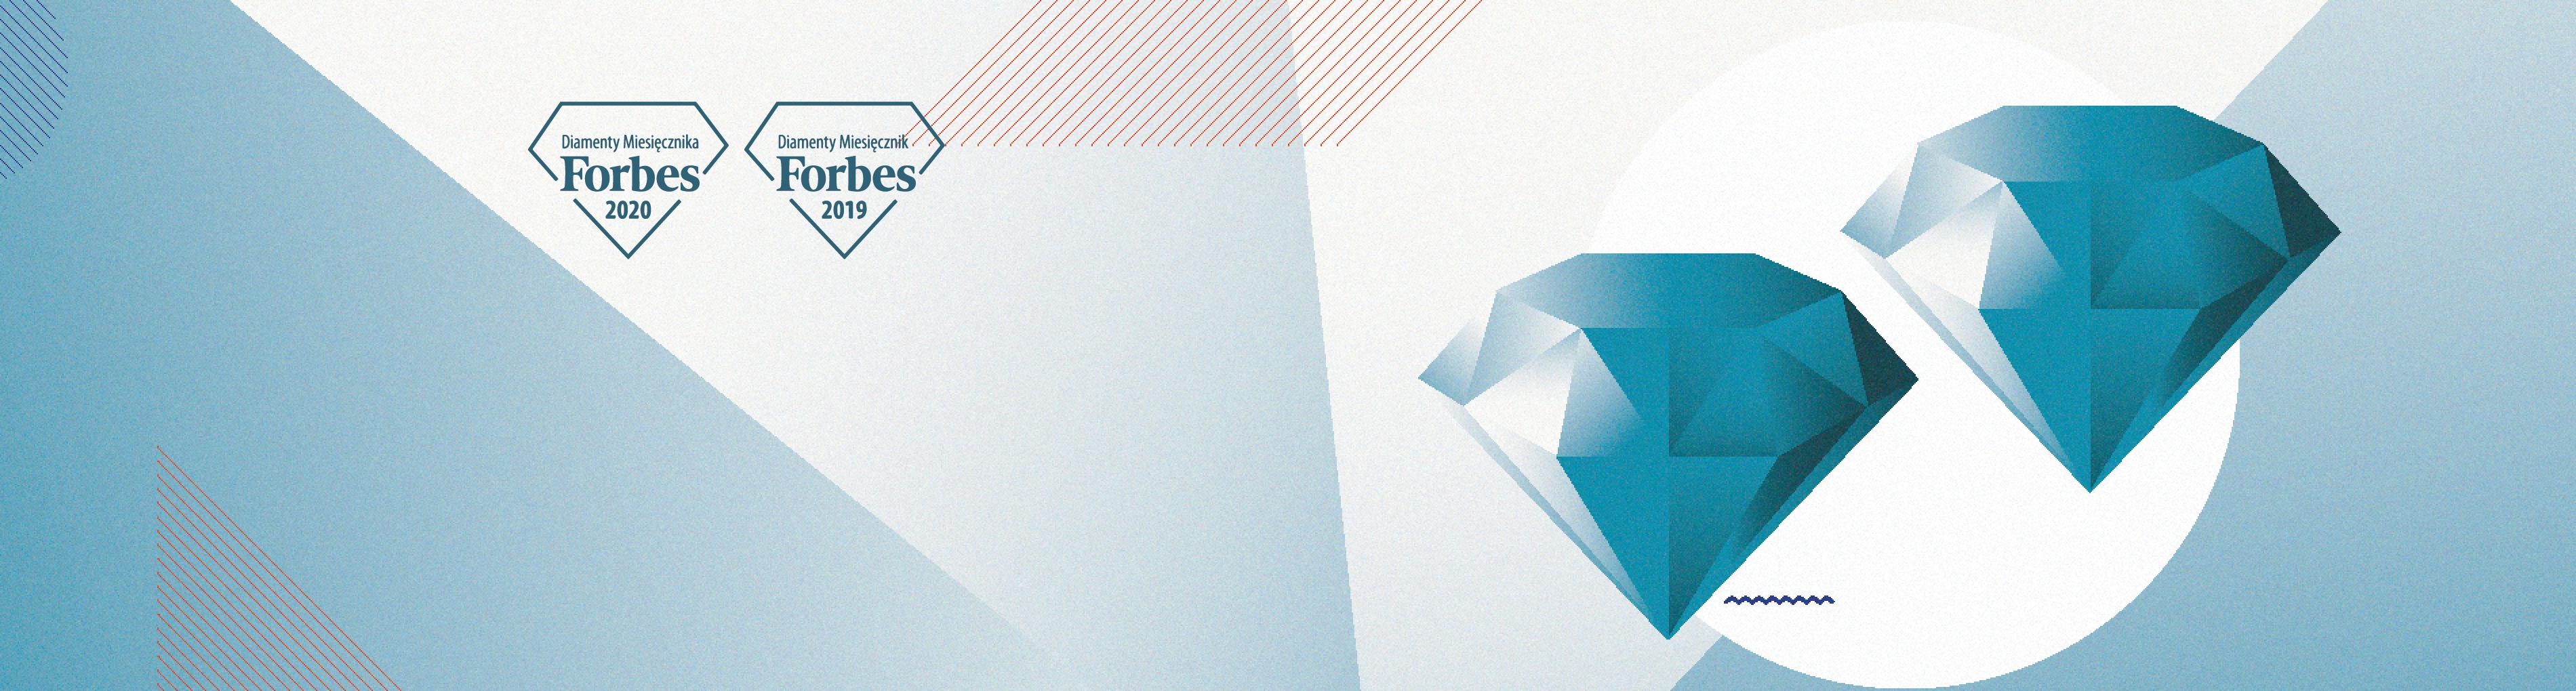 Forbes diamonds award for Skyrise.tech